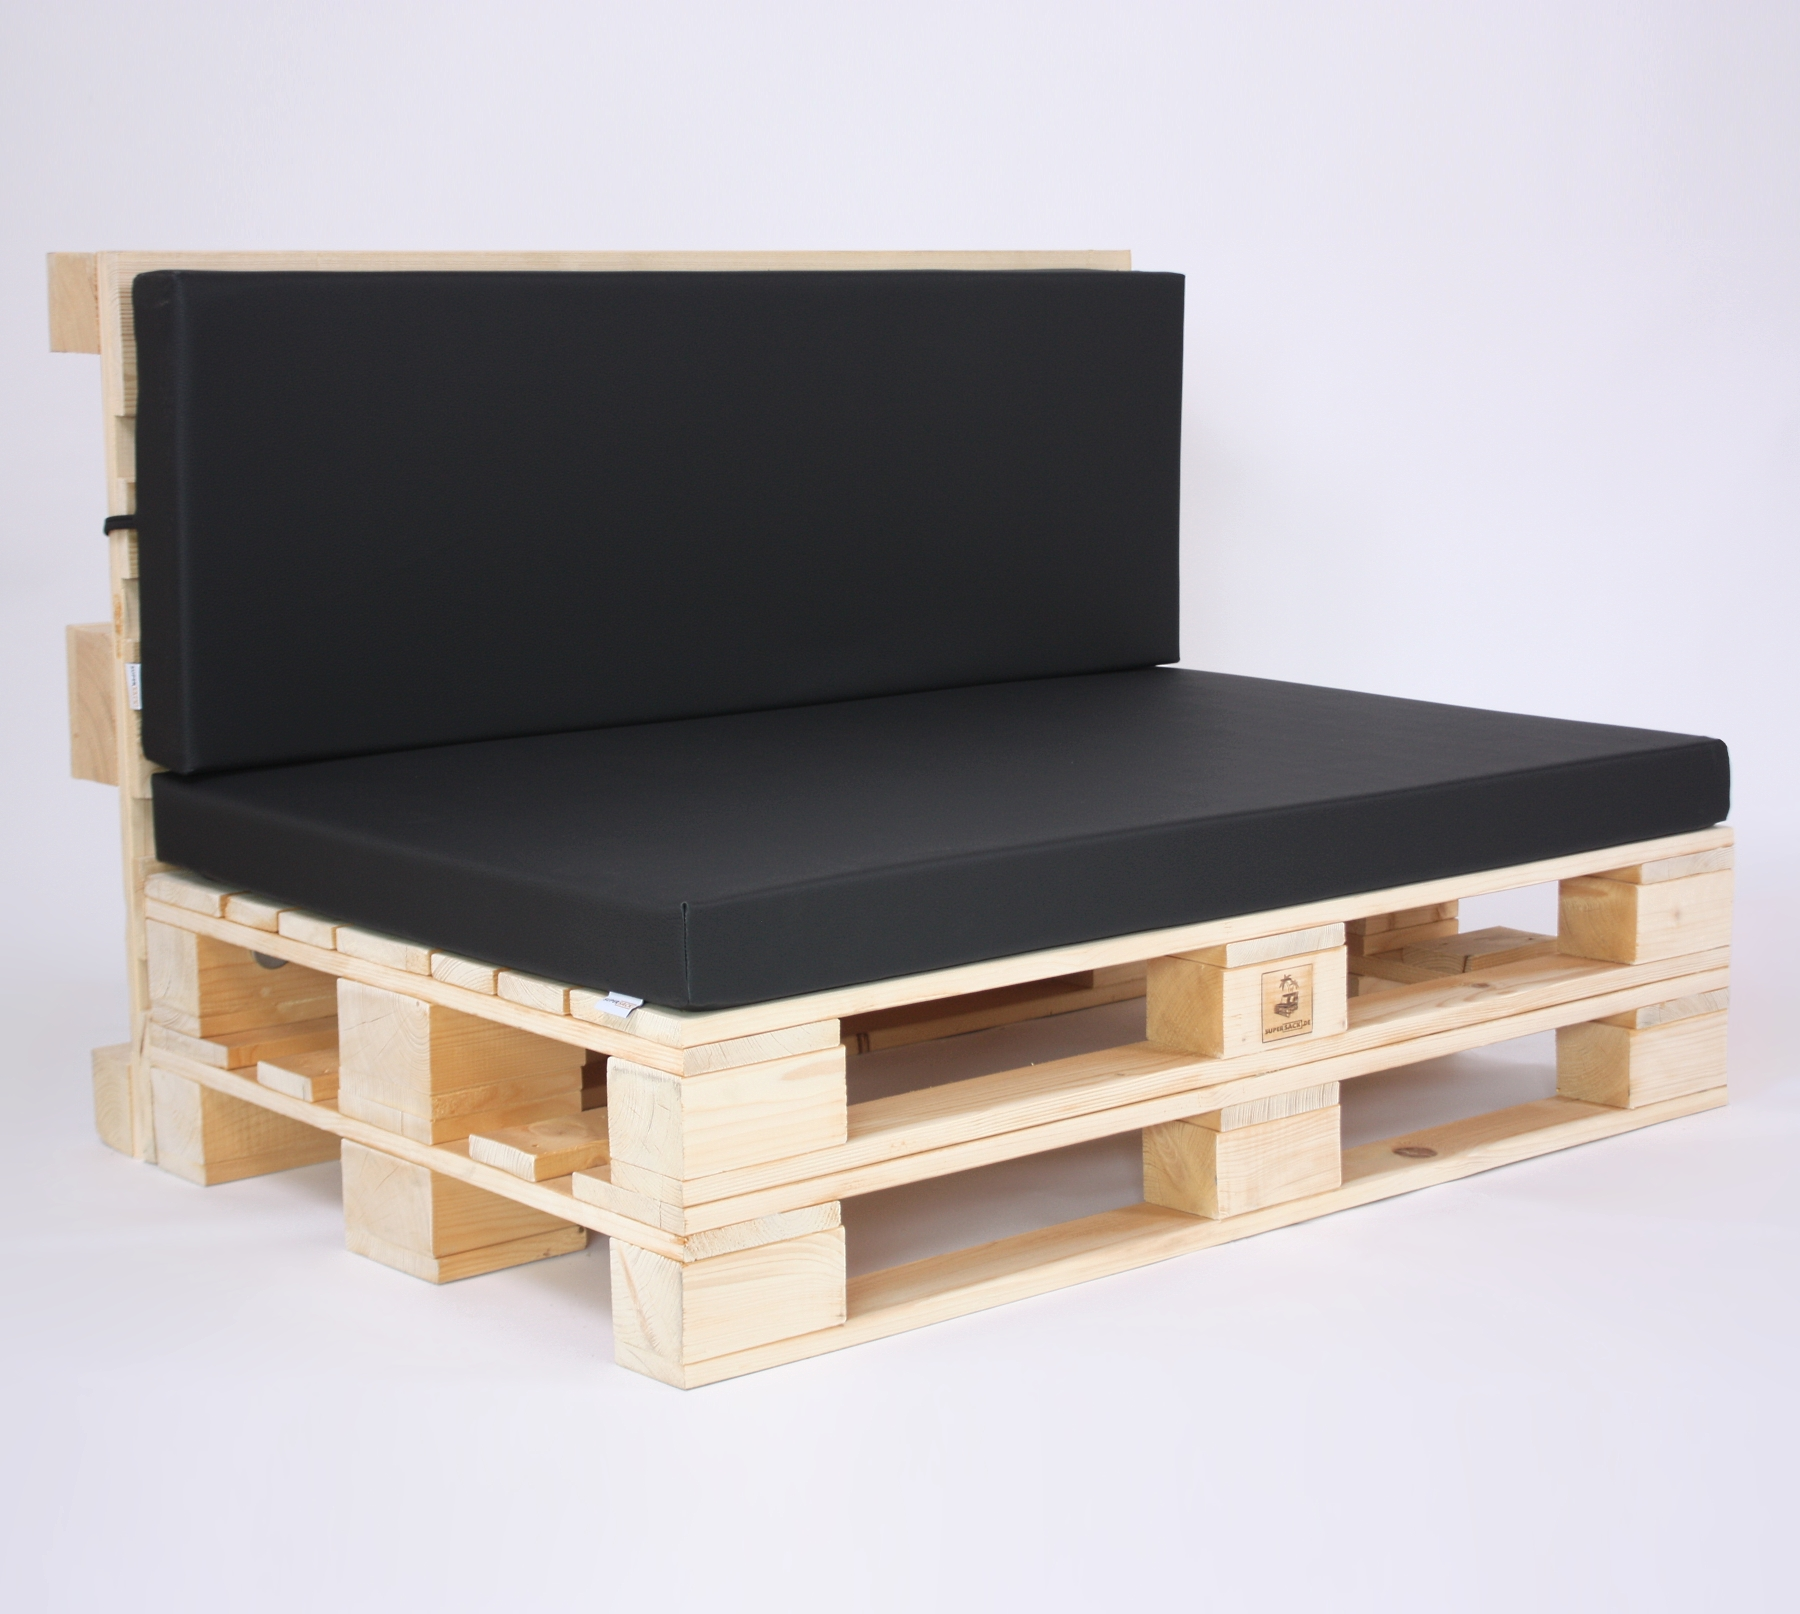 Paletten sofa kaufen - Palettenmobel sofa ...